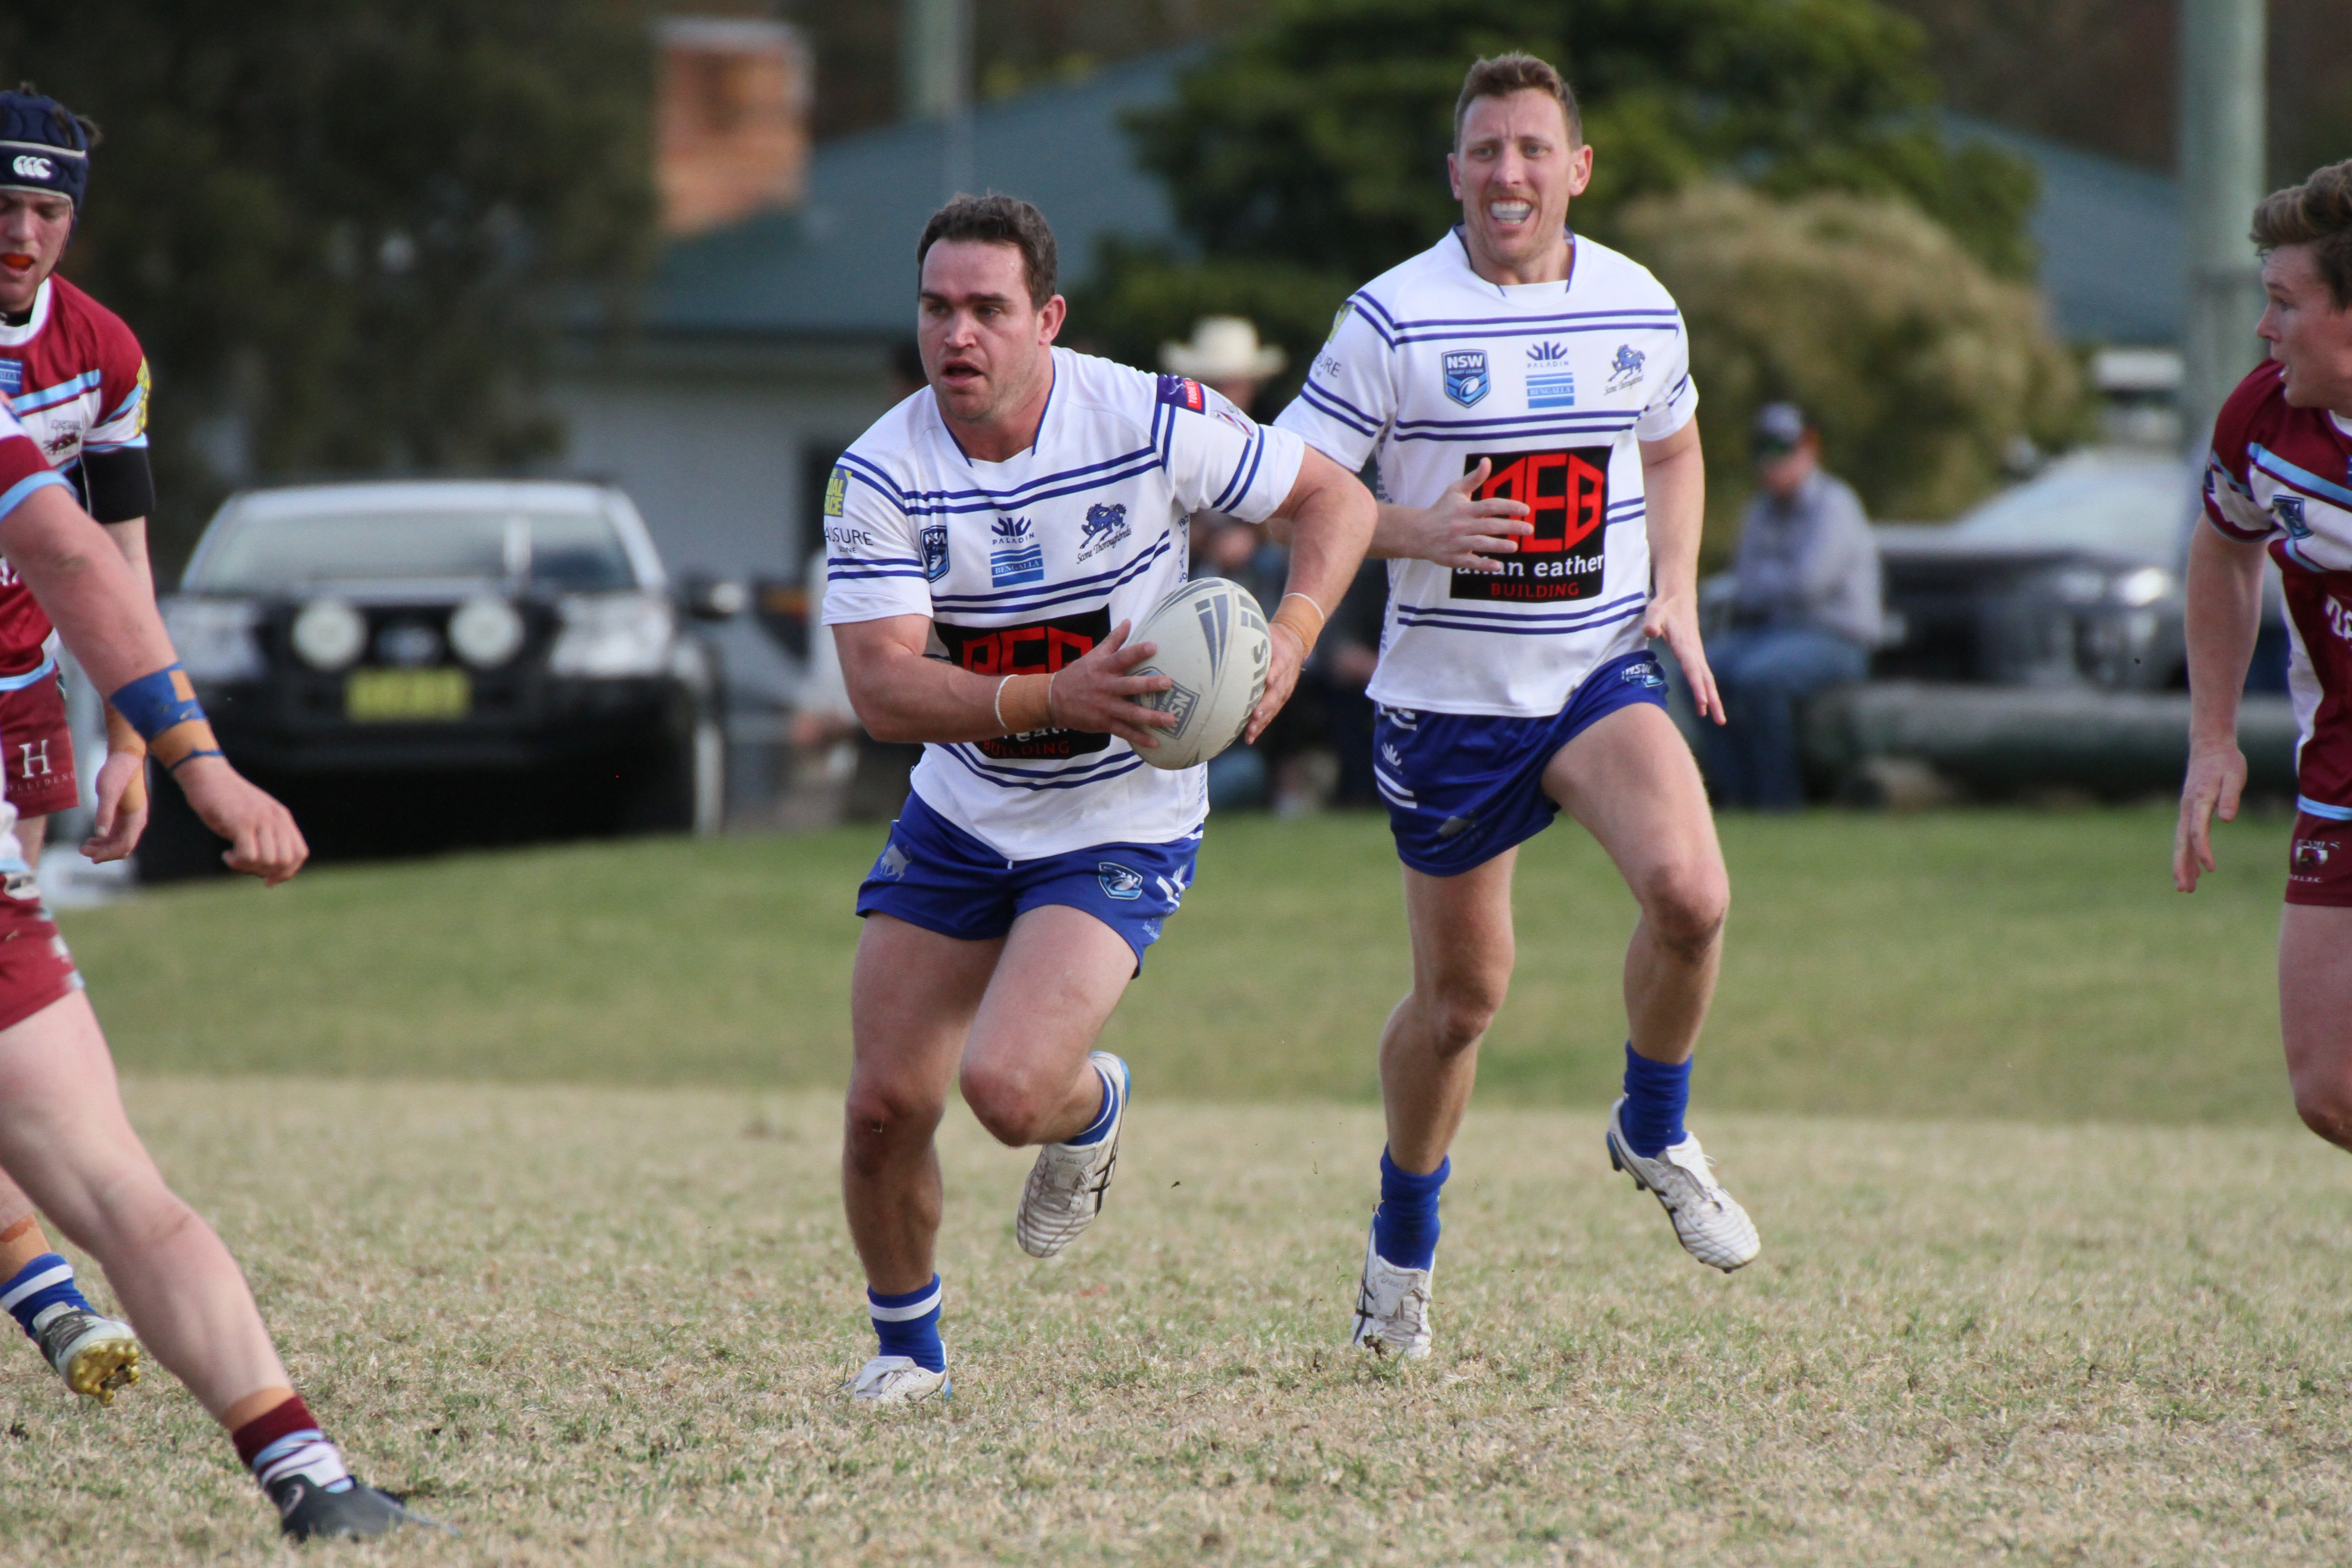 Captain-coach role for Clydsdale